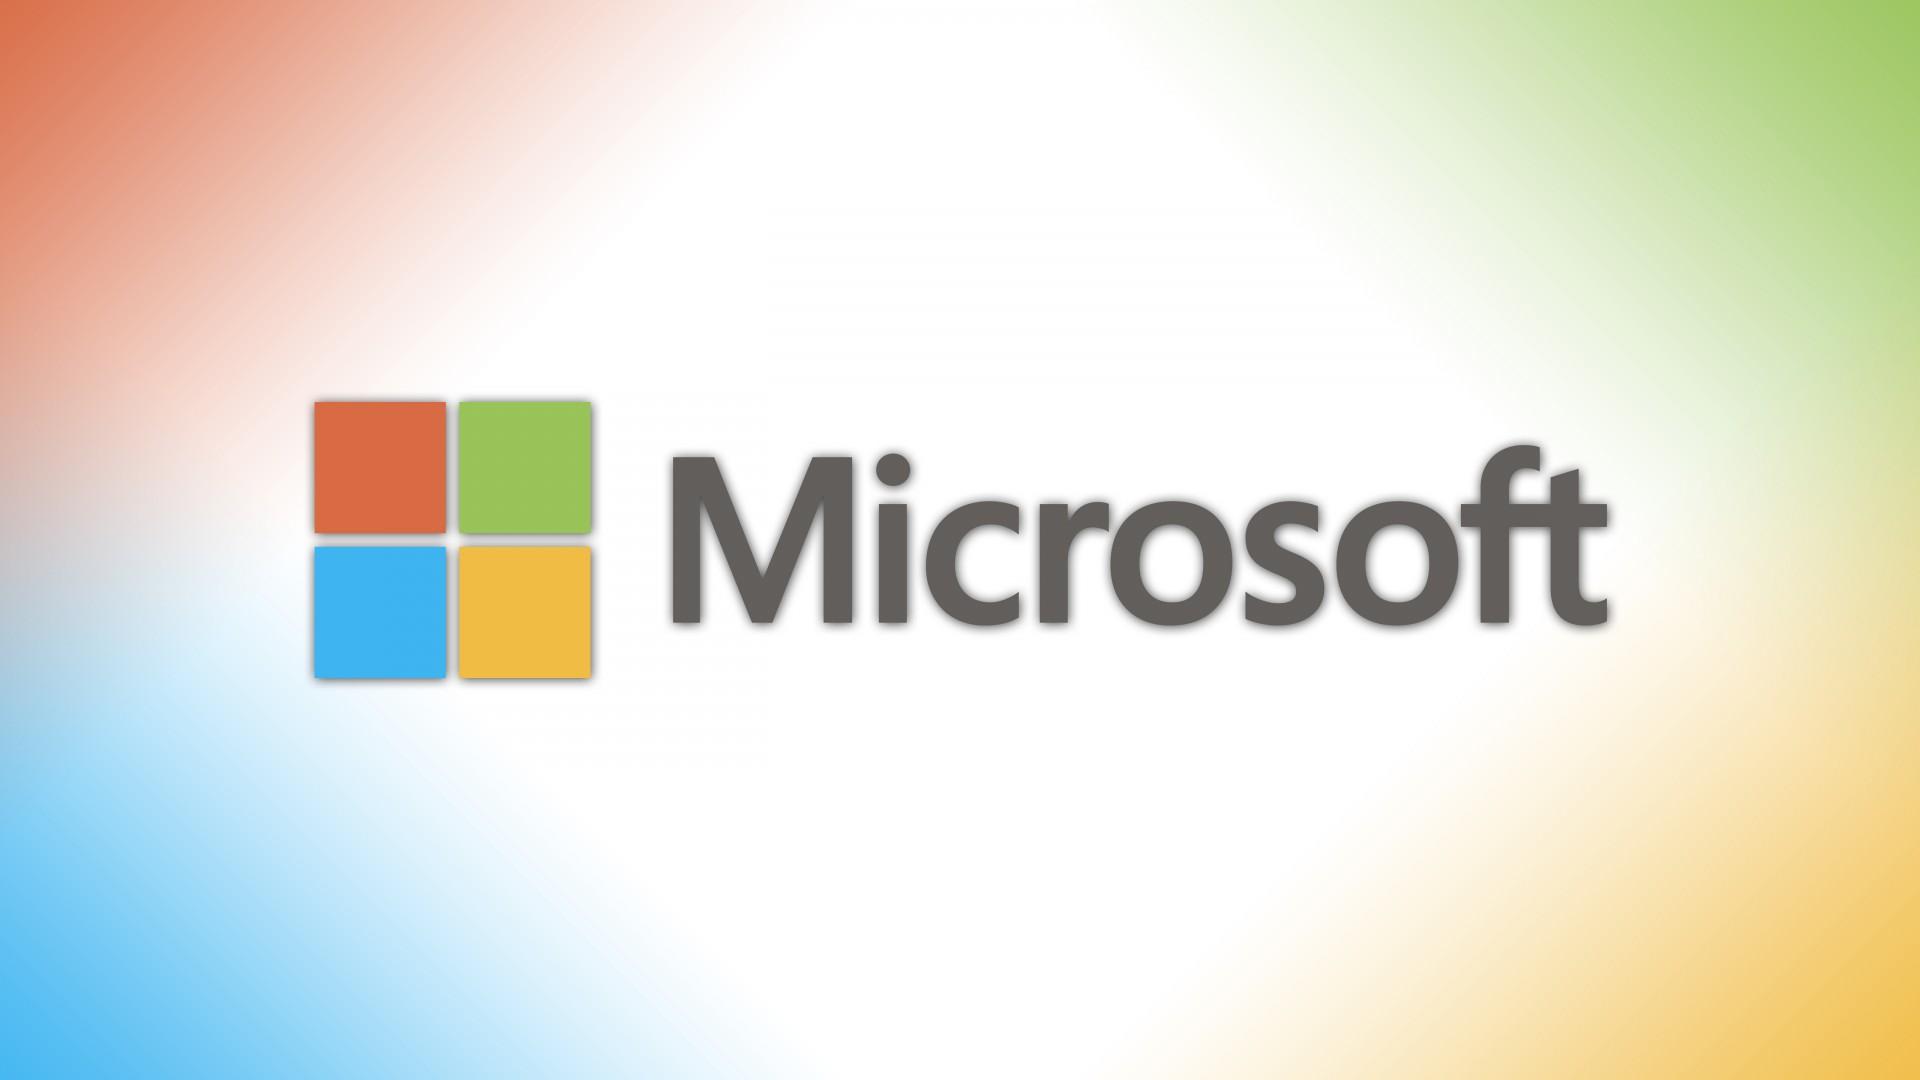 Microsoft Desktop Backgrounds Wide 1920x1080